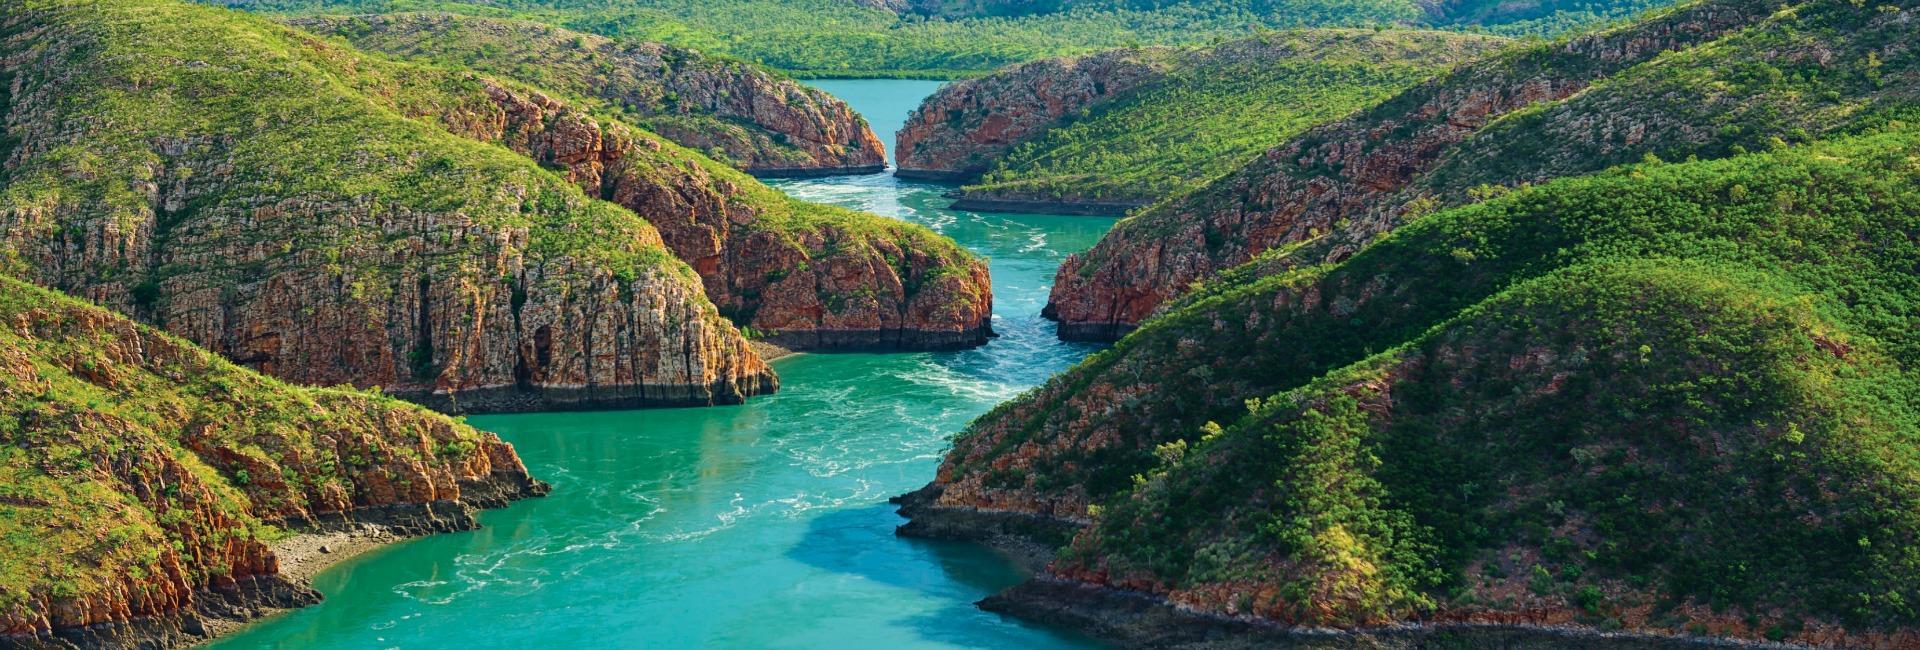 Horizontal falls australia